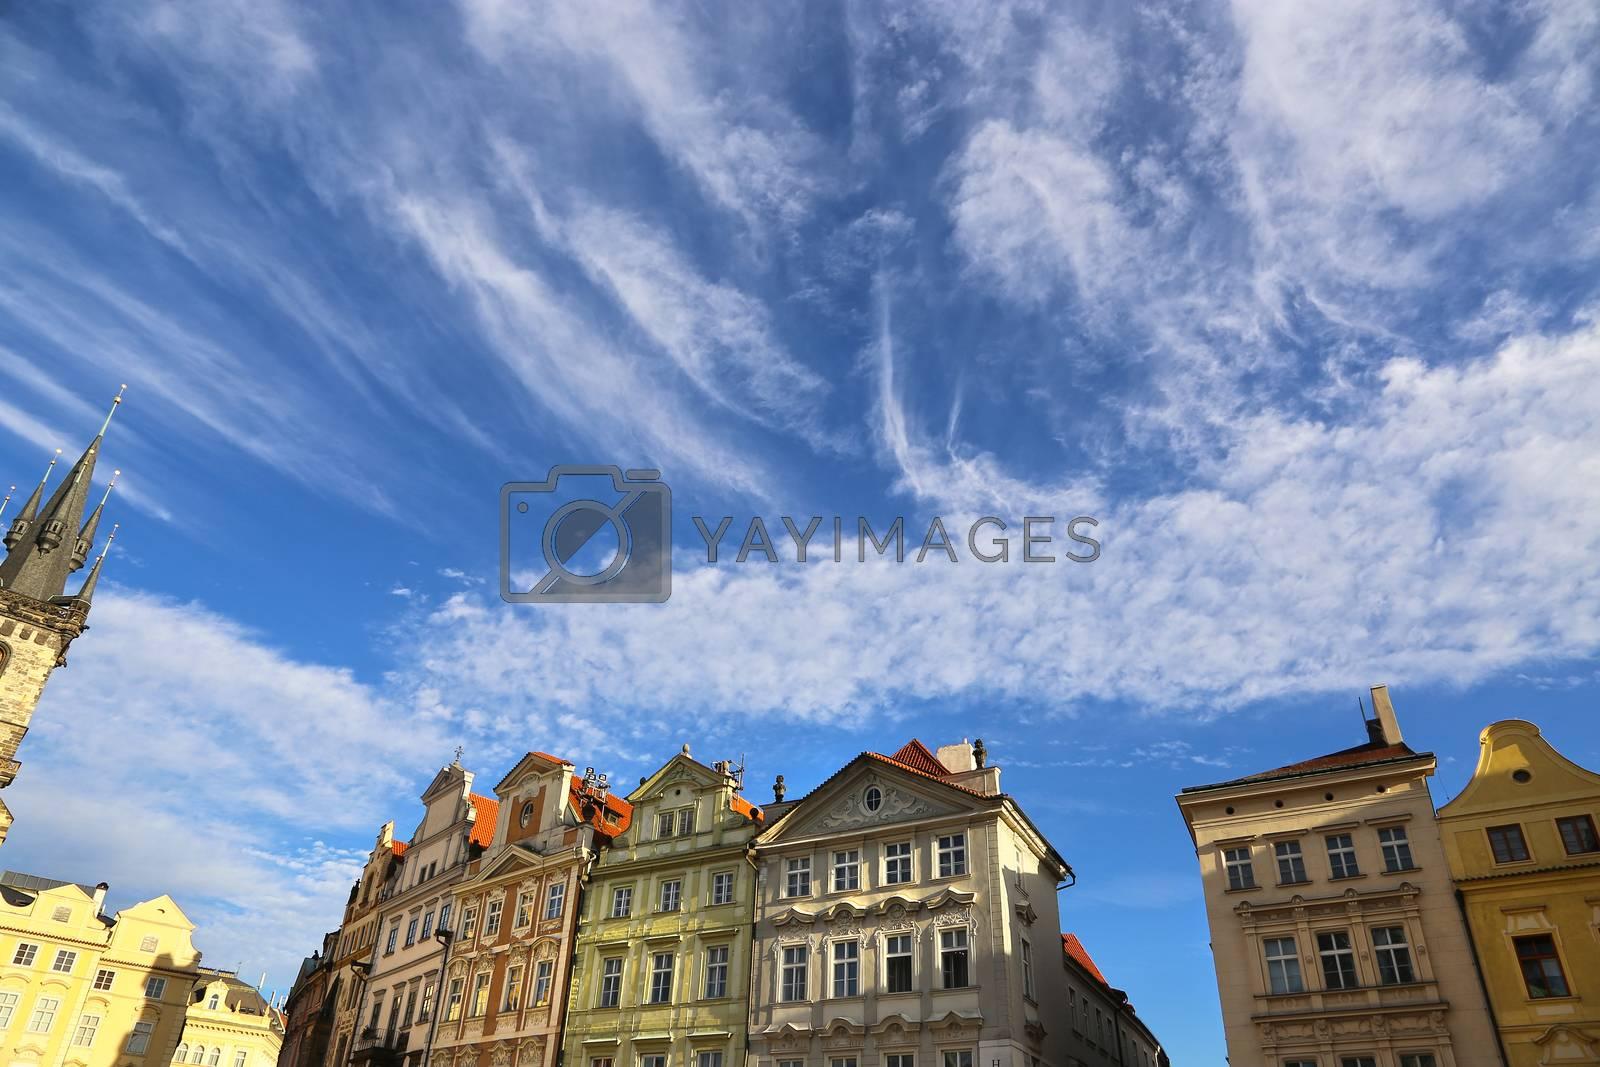 Row houses on blue sky background in Prague (Stare mesto), Czech Republic